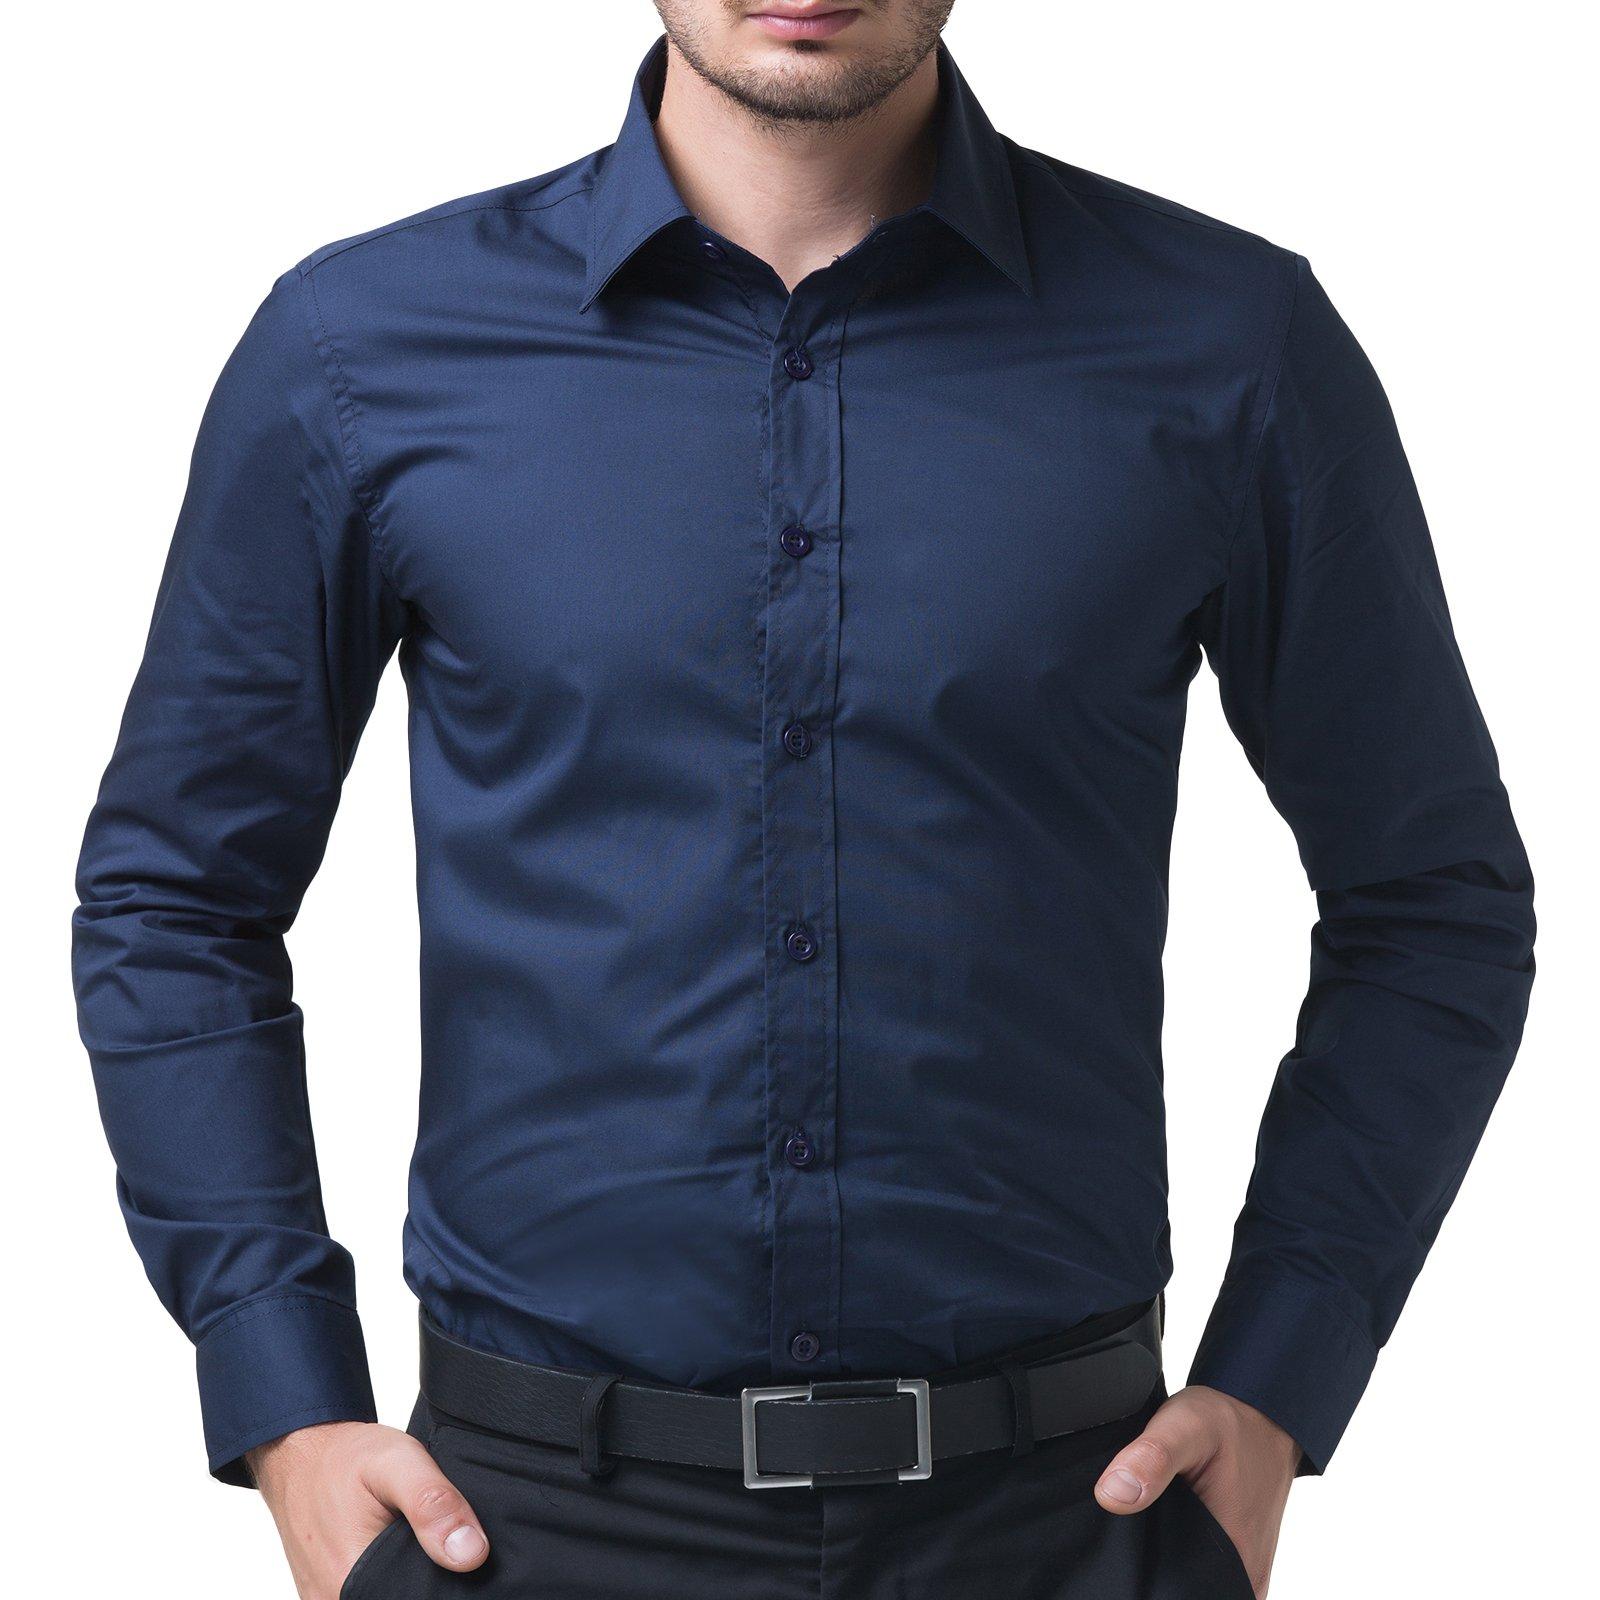 Paul Jones Mens Shirts Sexy Leisure Oversized Shirts Top Blouse (5XL, Navy Blue 52-4)